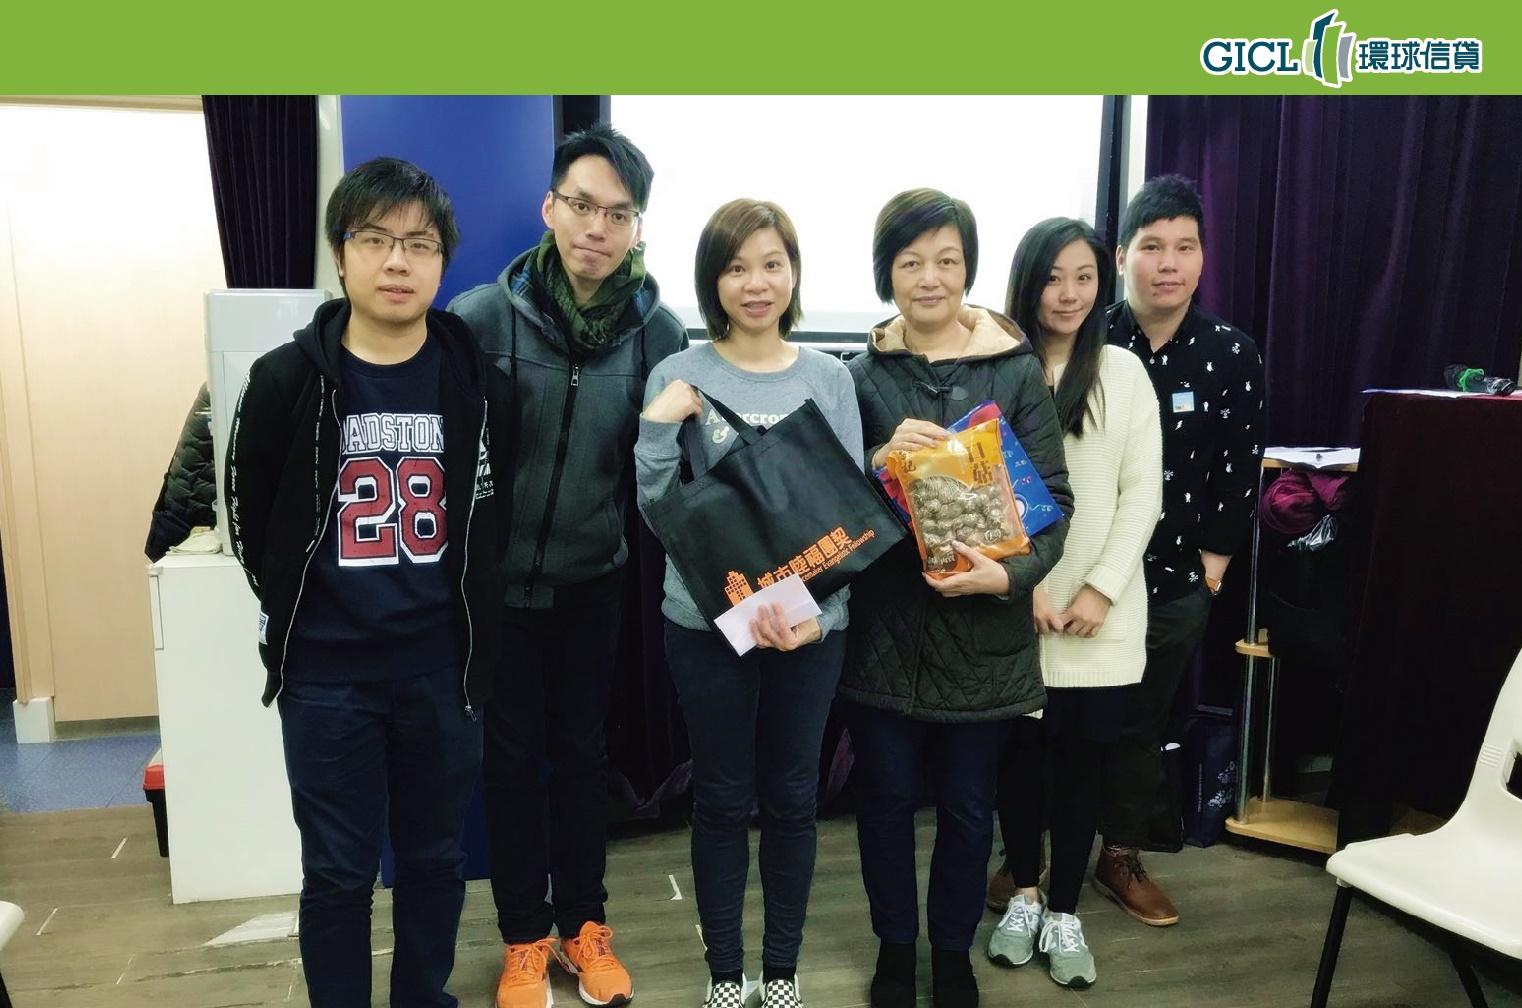 GICL X UPEF – HOME VISIT ACTIVITY IN TSUEN WAN 2018